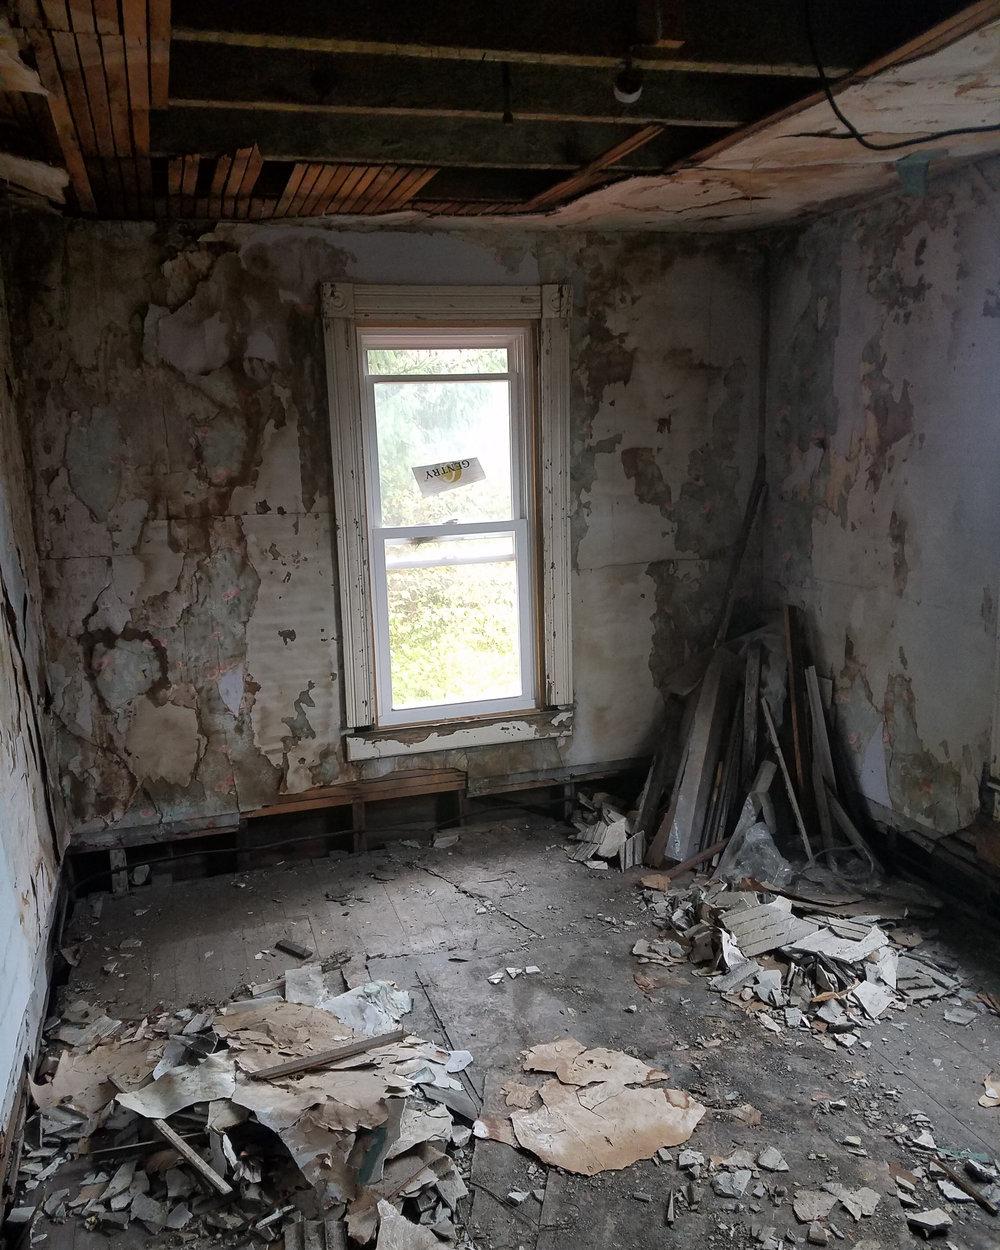 Apt5-lv-room.jpg